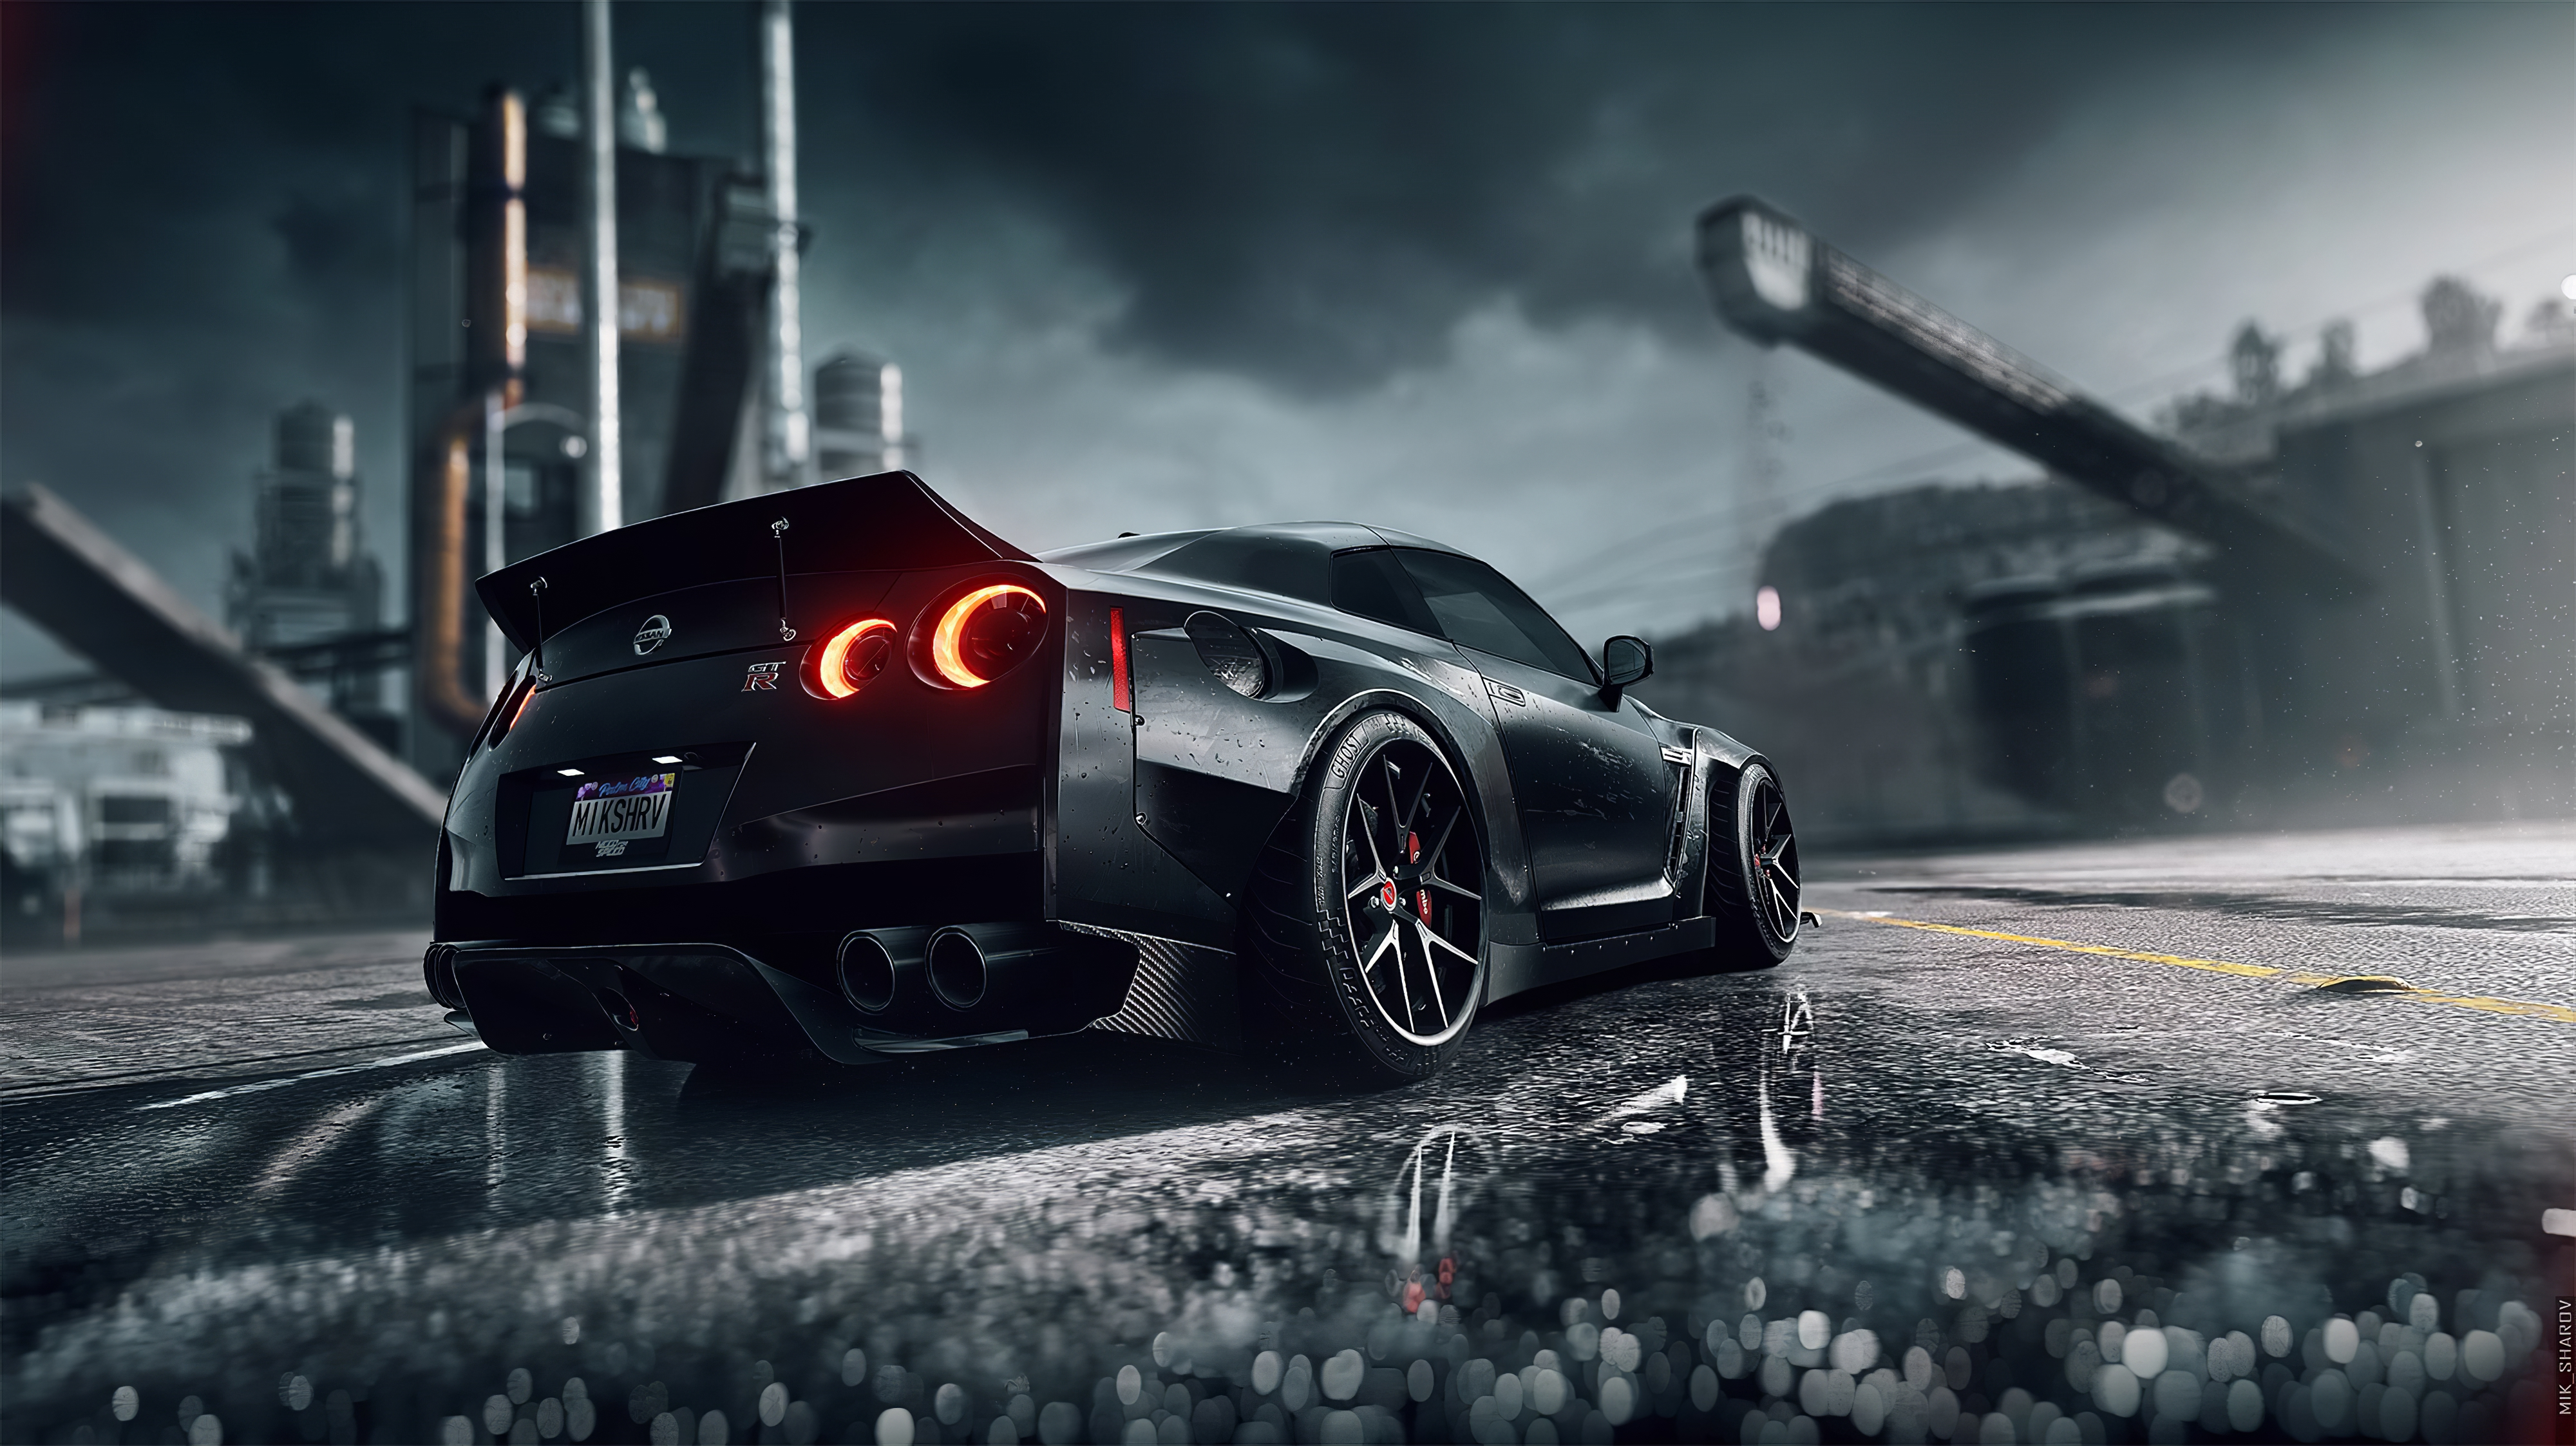 4000x3000 Need For Speed Heat Nissan Gtr 4k 4000x3000 Resolution